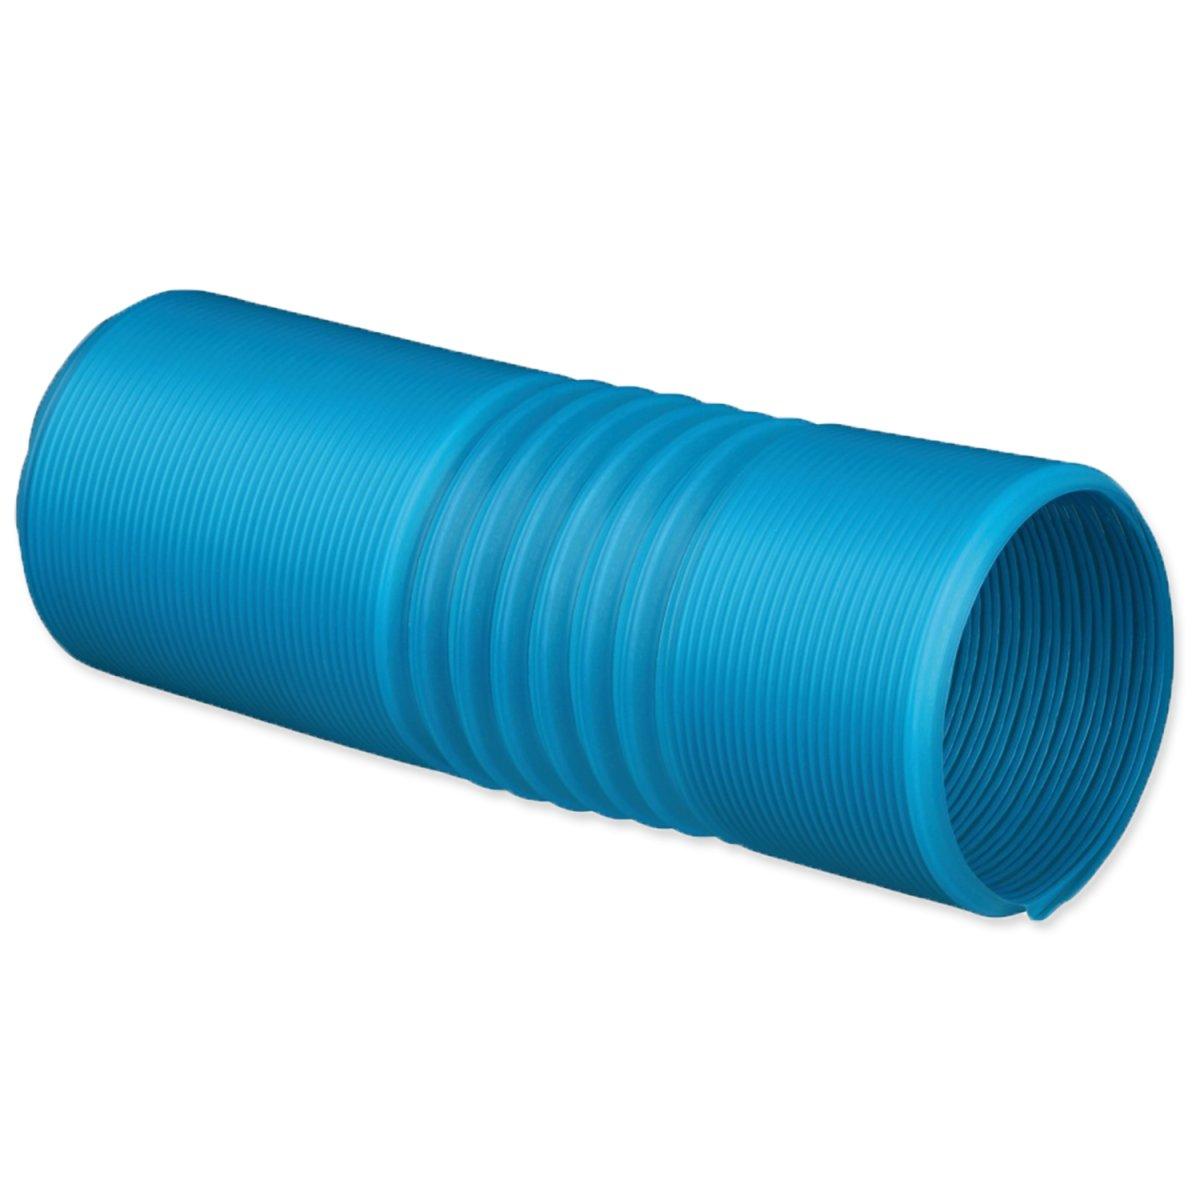 Hračka TRIXIE tunel plastový tyrkysový (1ks)